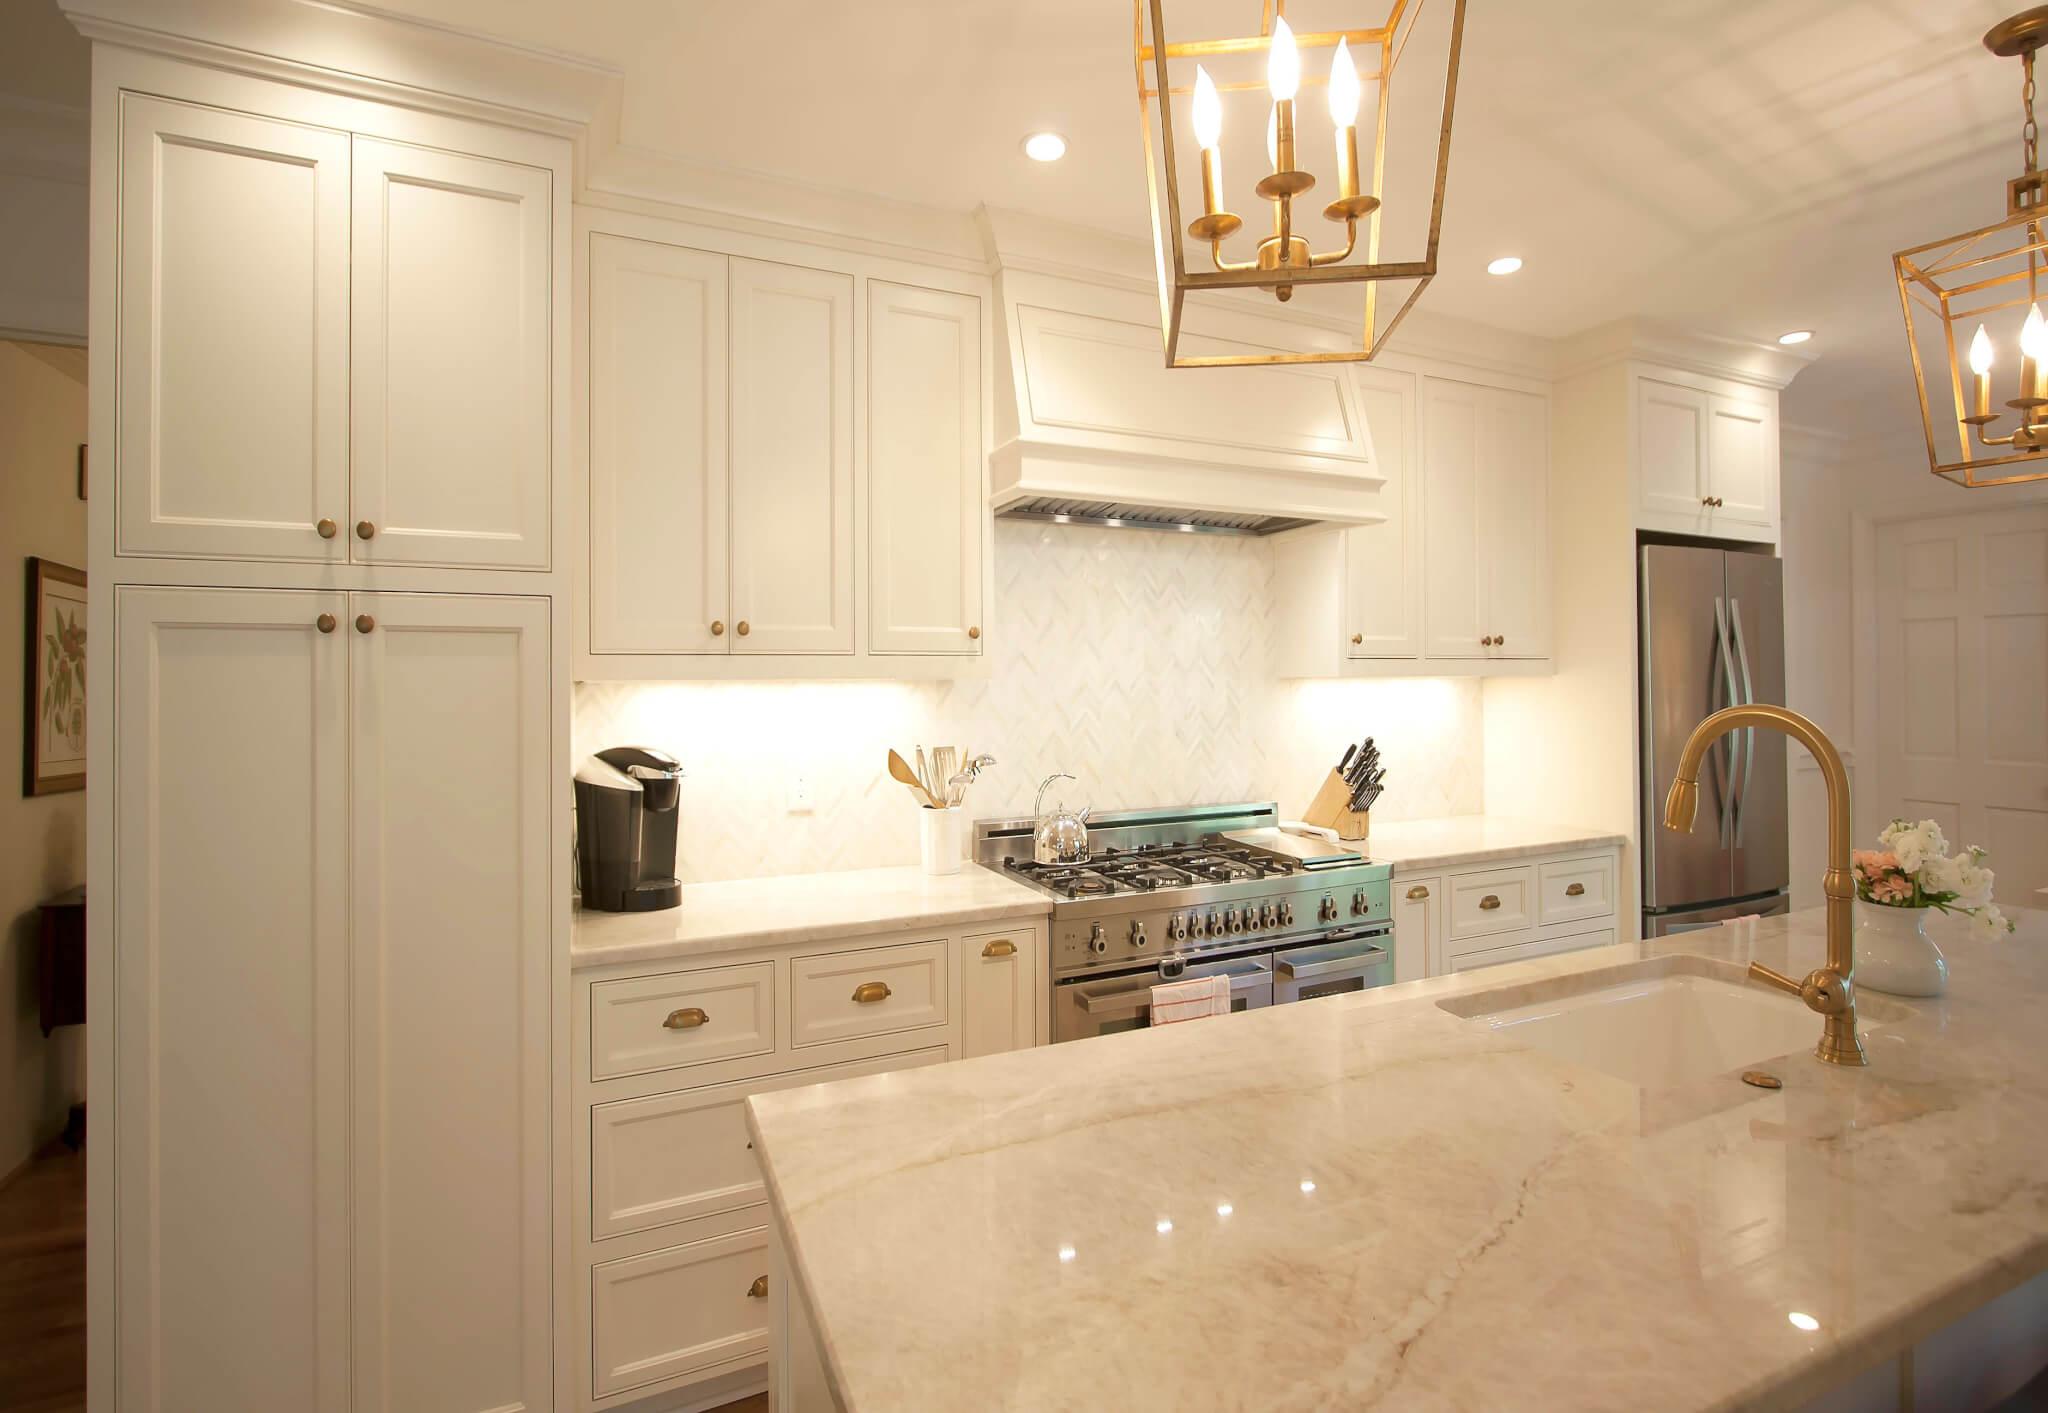 Strange White Flat Panel Custom Cabinets Antique Brass Lights Home Interior And Landscaping Spoatsignezvosmurscom